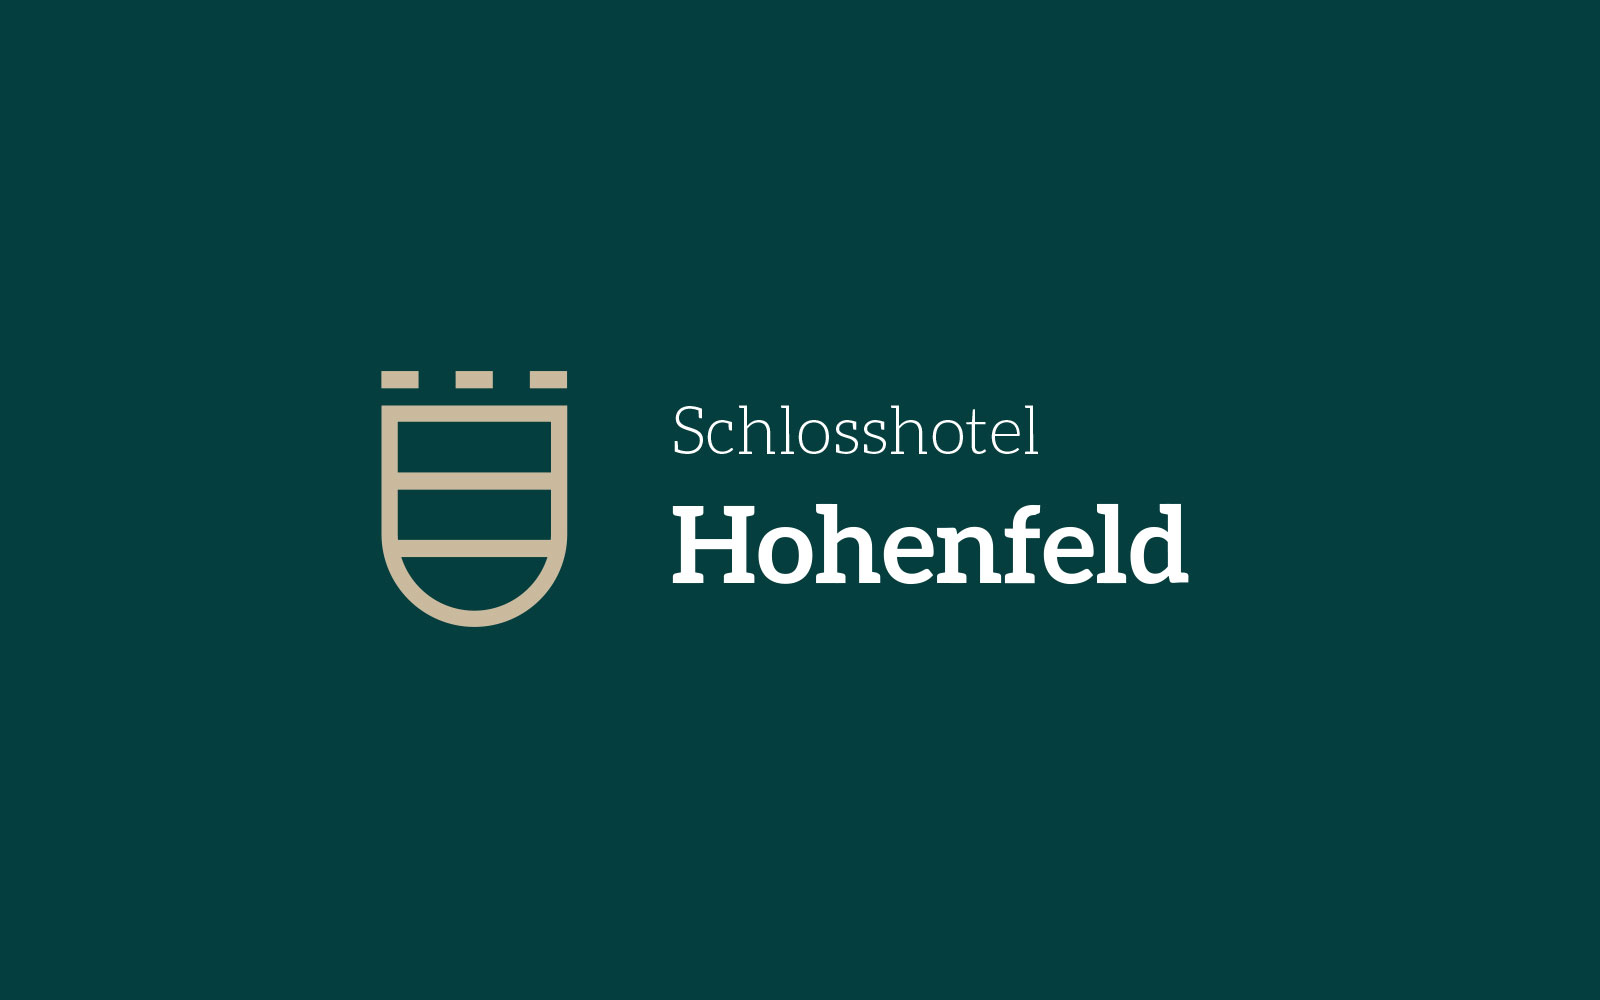 hohenfeld_1600p_logo_2